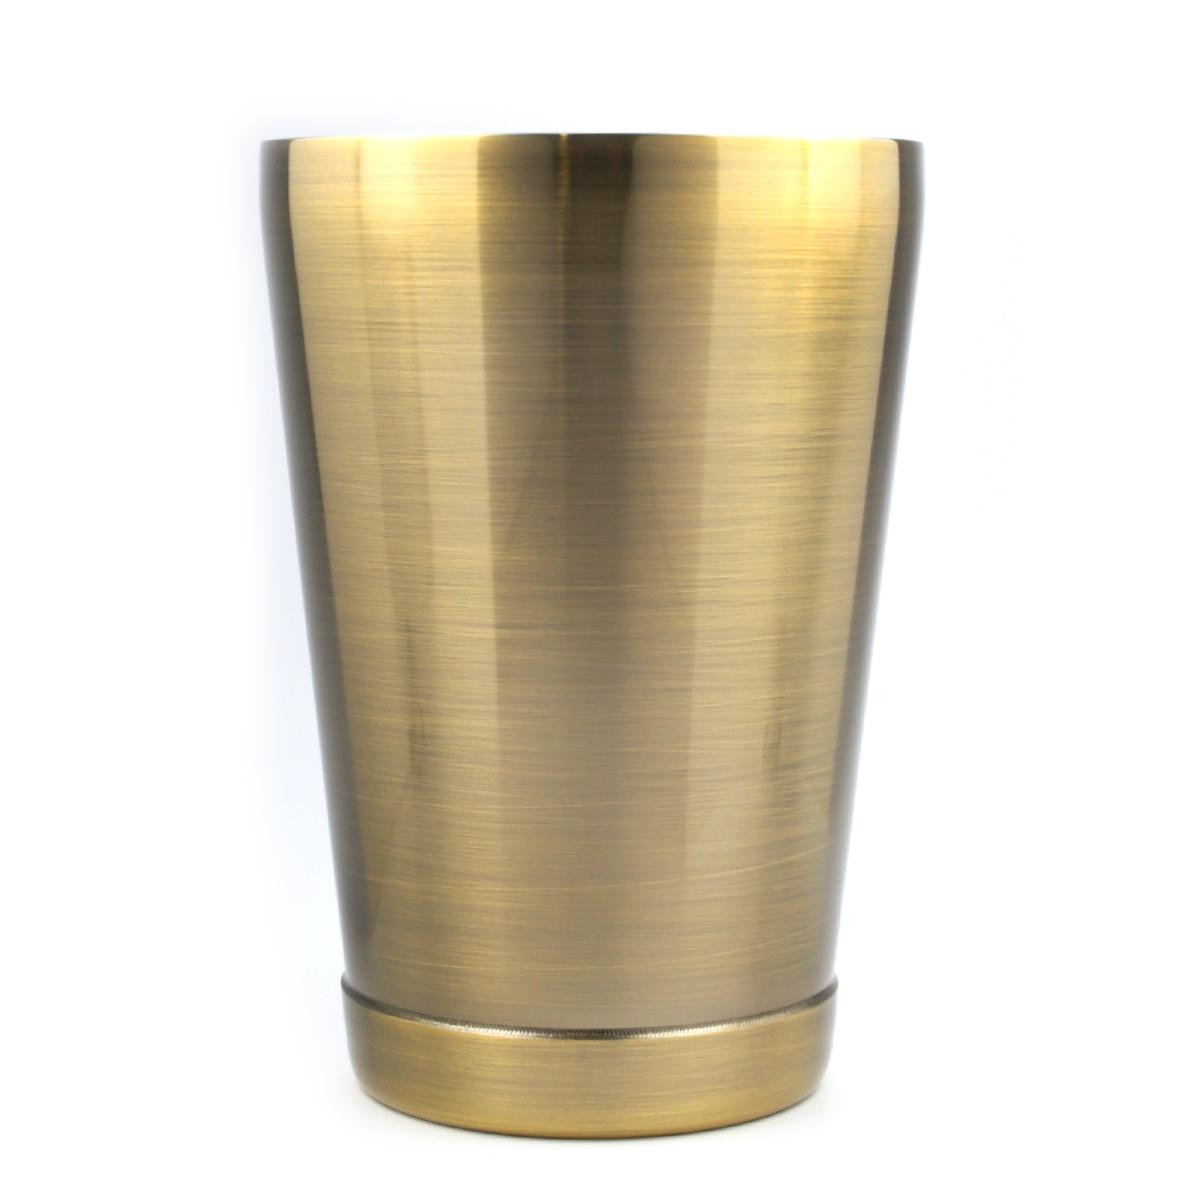 Boston Shaker - Cheater Antique Brass 16oz